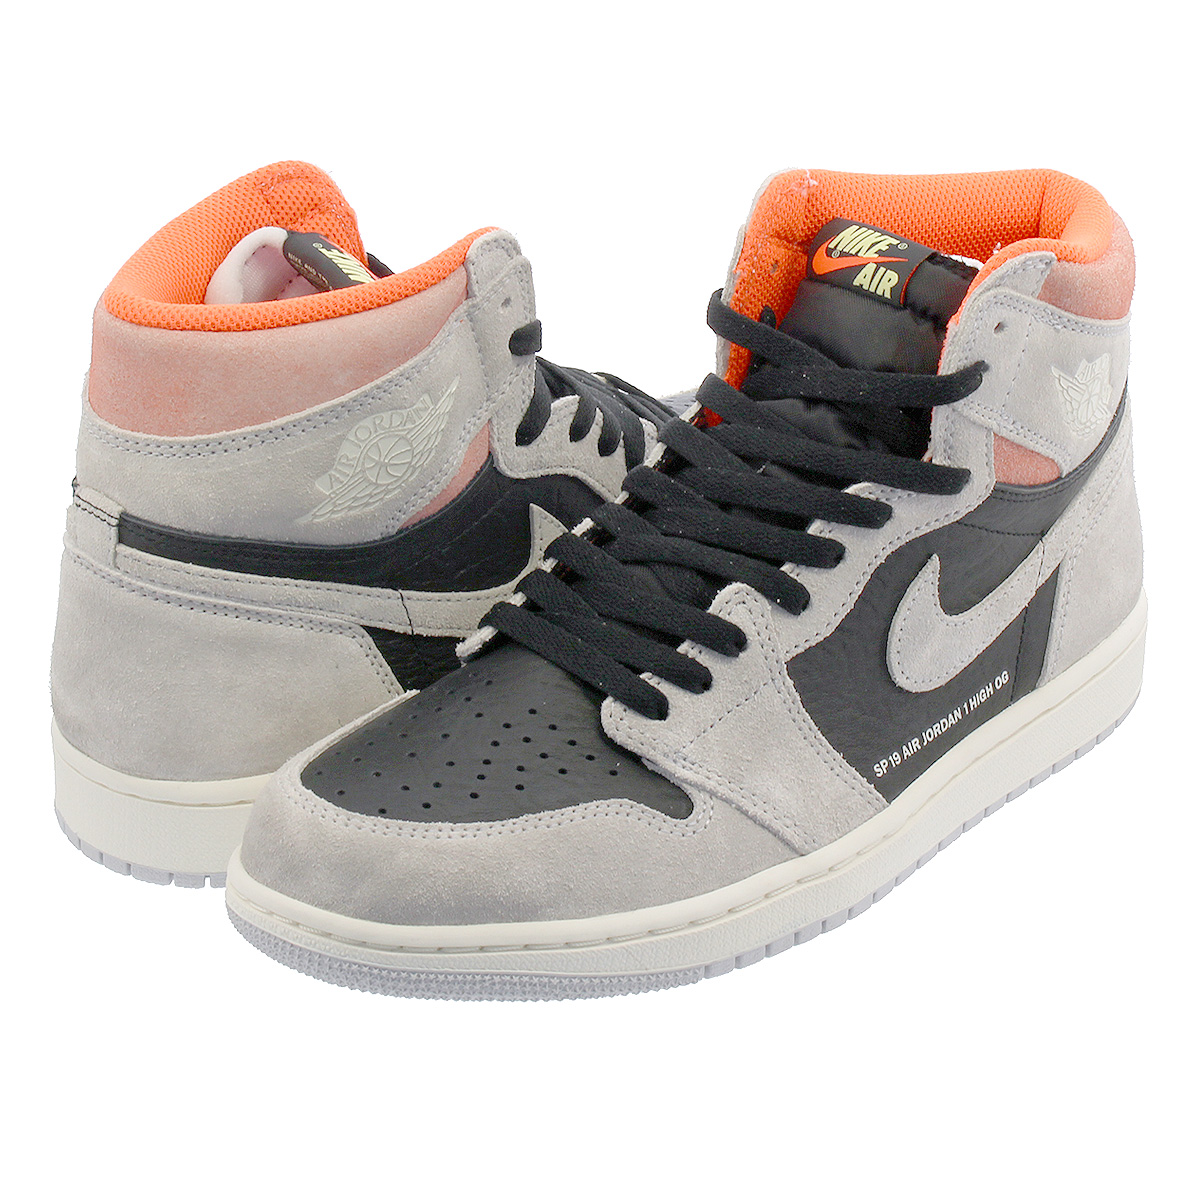 80a64fa0a2aa22 NIKE AIR JORDAN 1 RETRO HIGH OG Nike Air Jordan 1 nostalgic high OG NEUTRAL  GREY BLACK 555